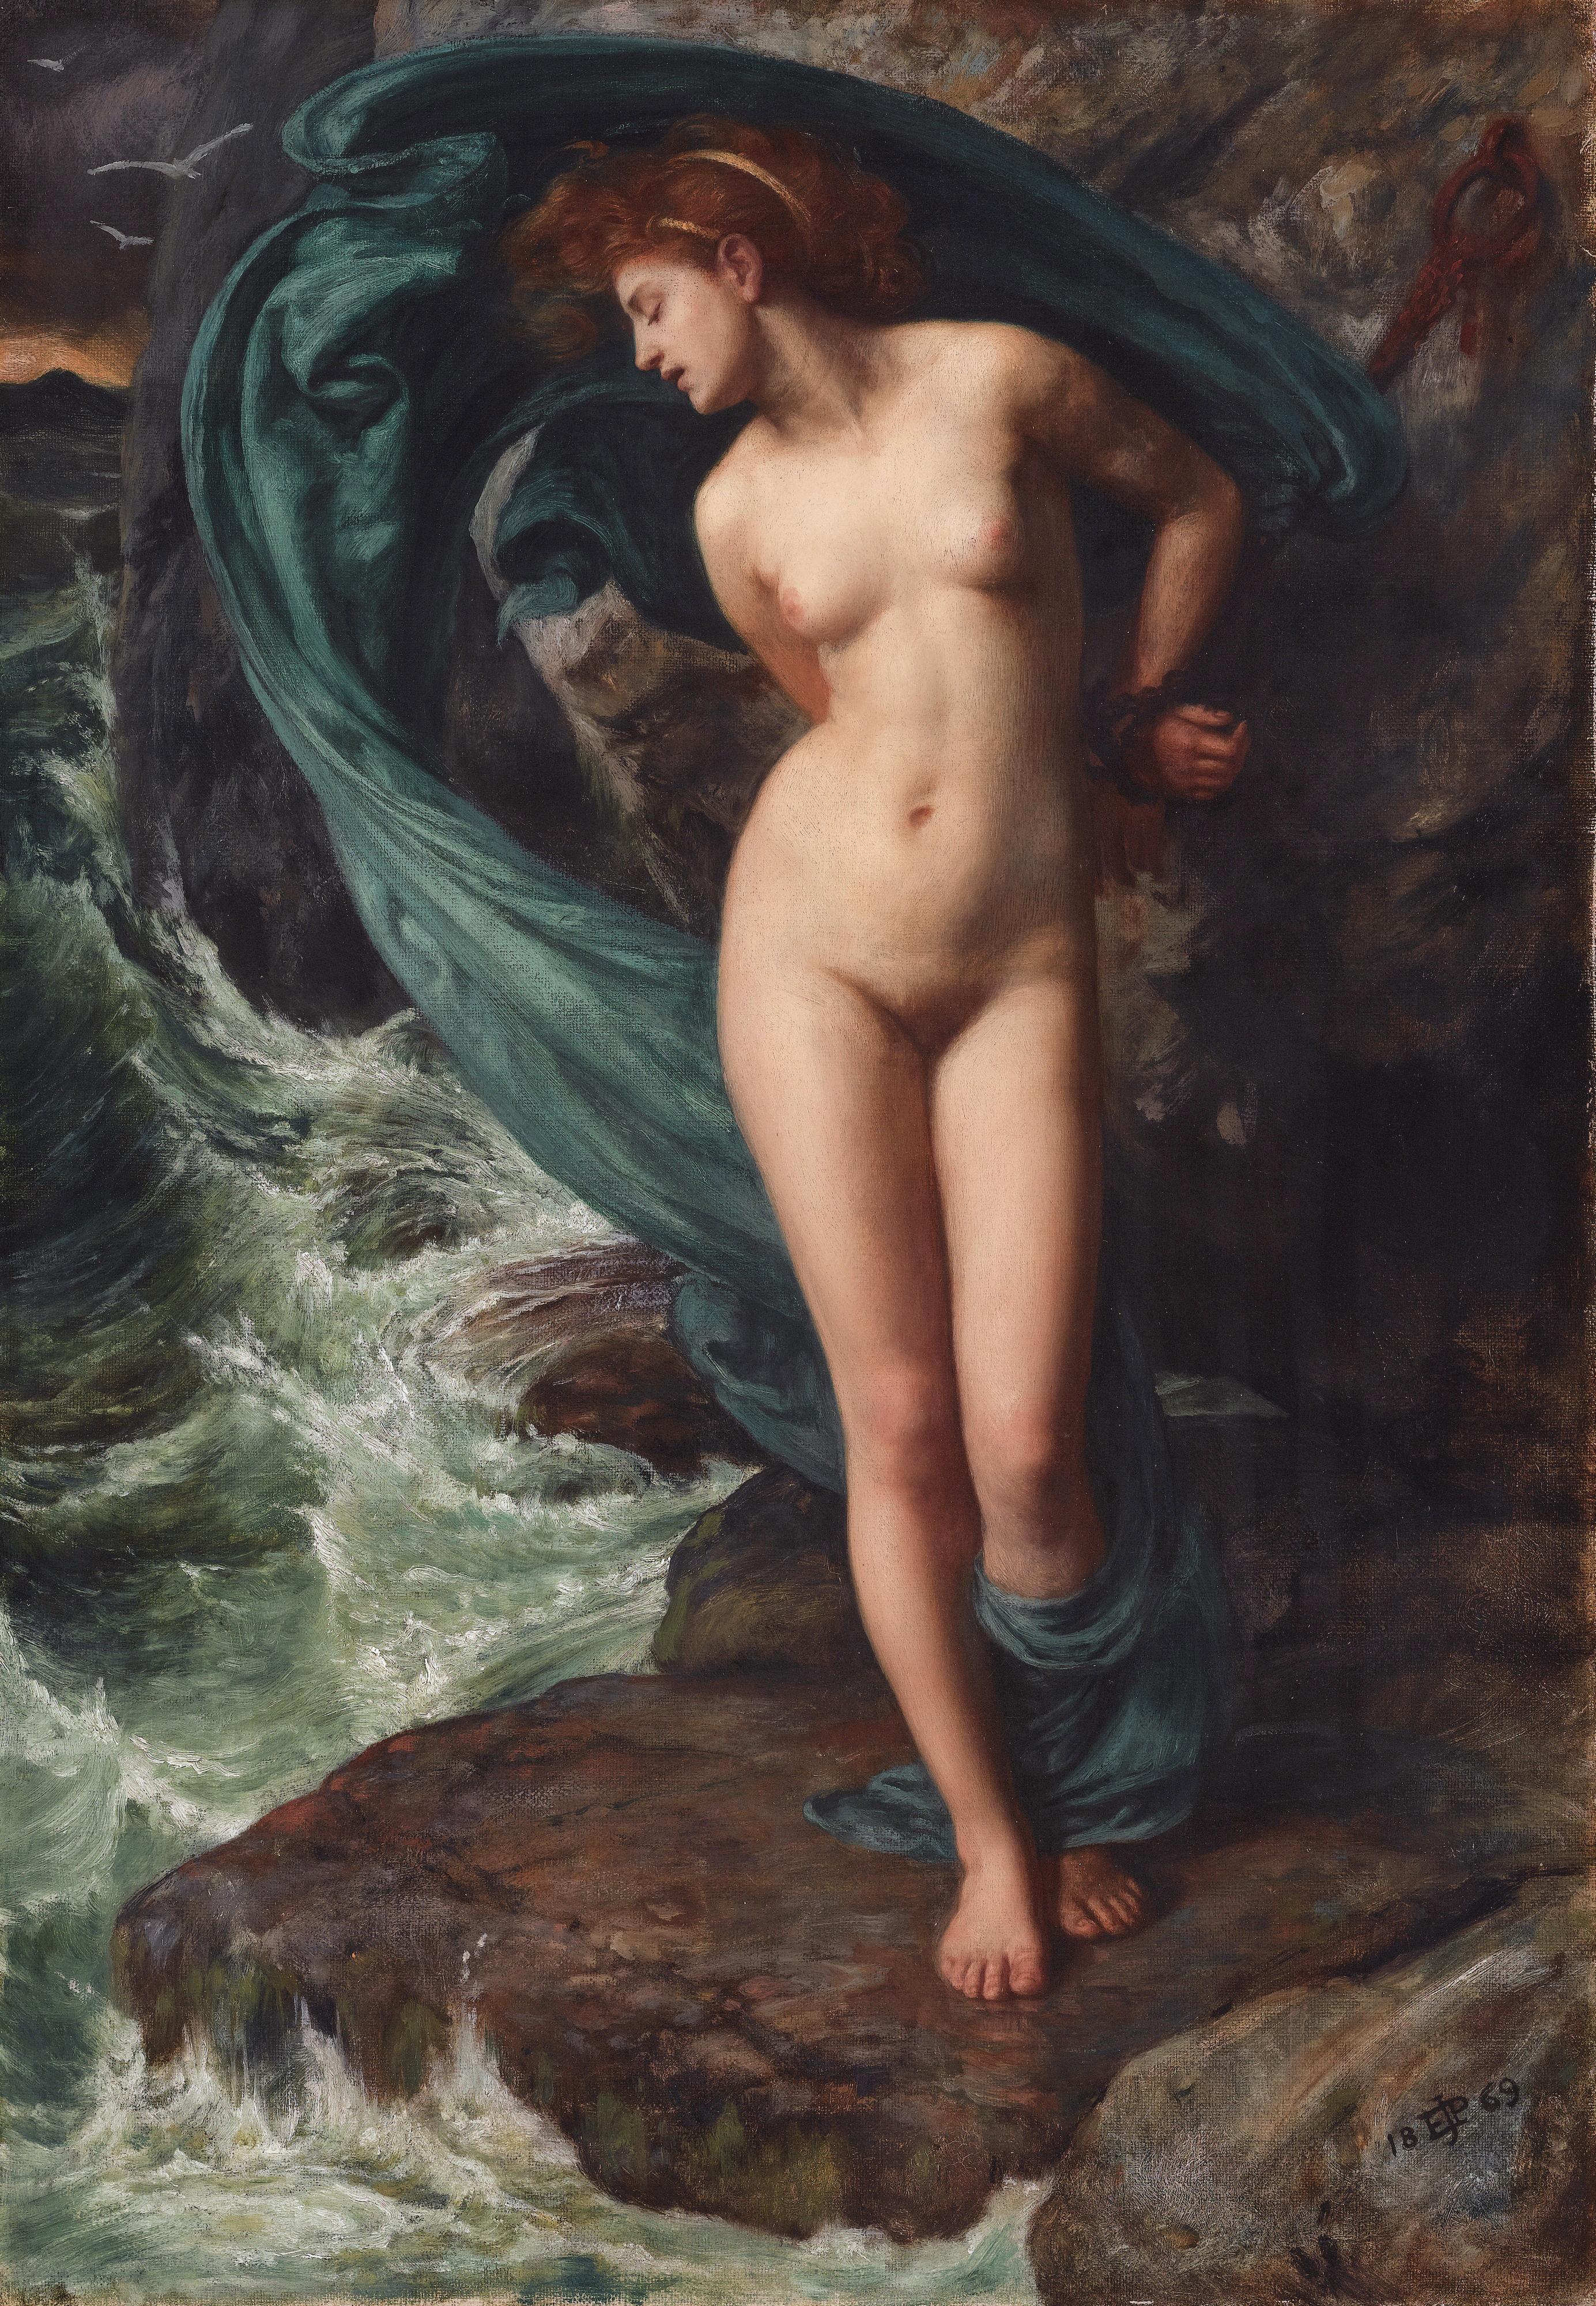 Mona the virgin nymph 1970 8